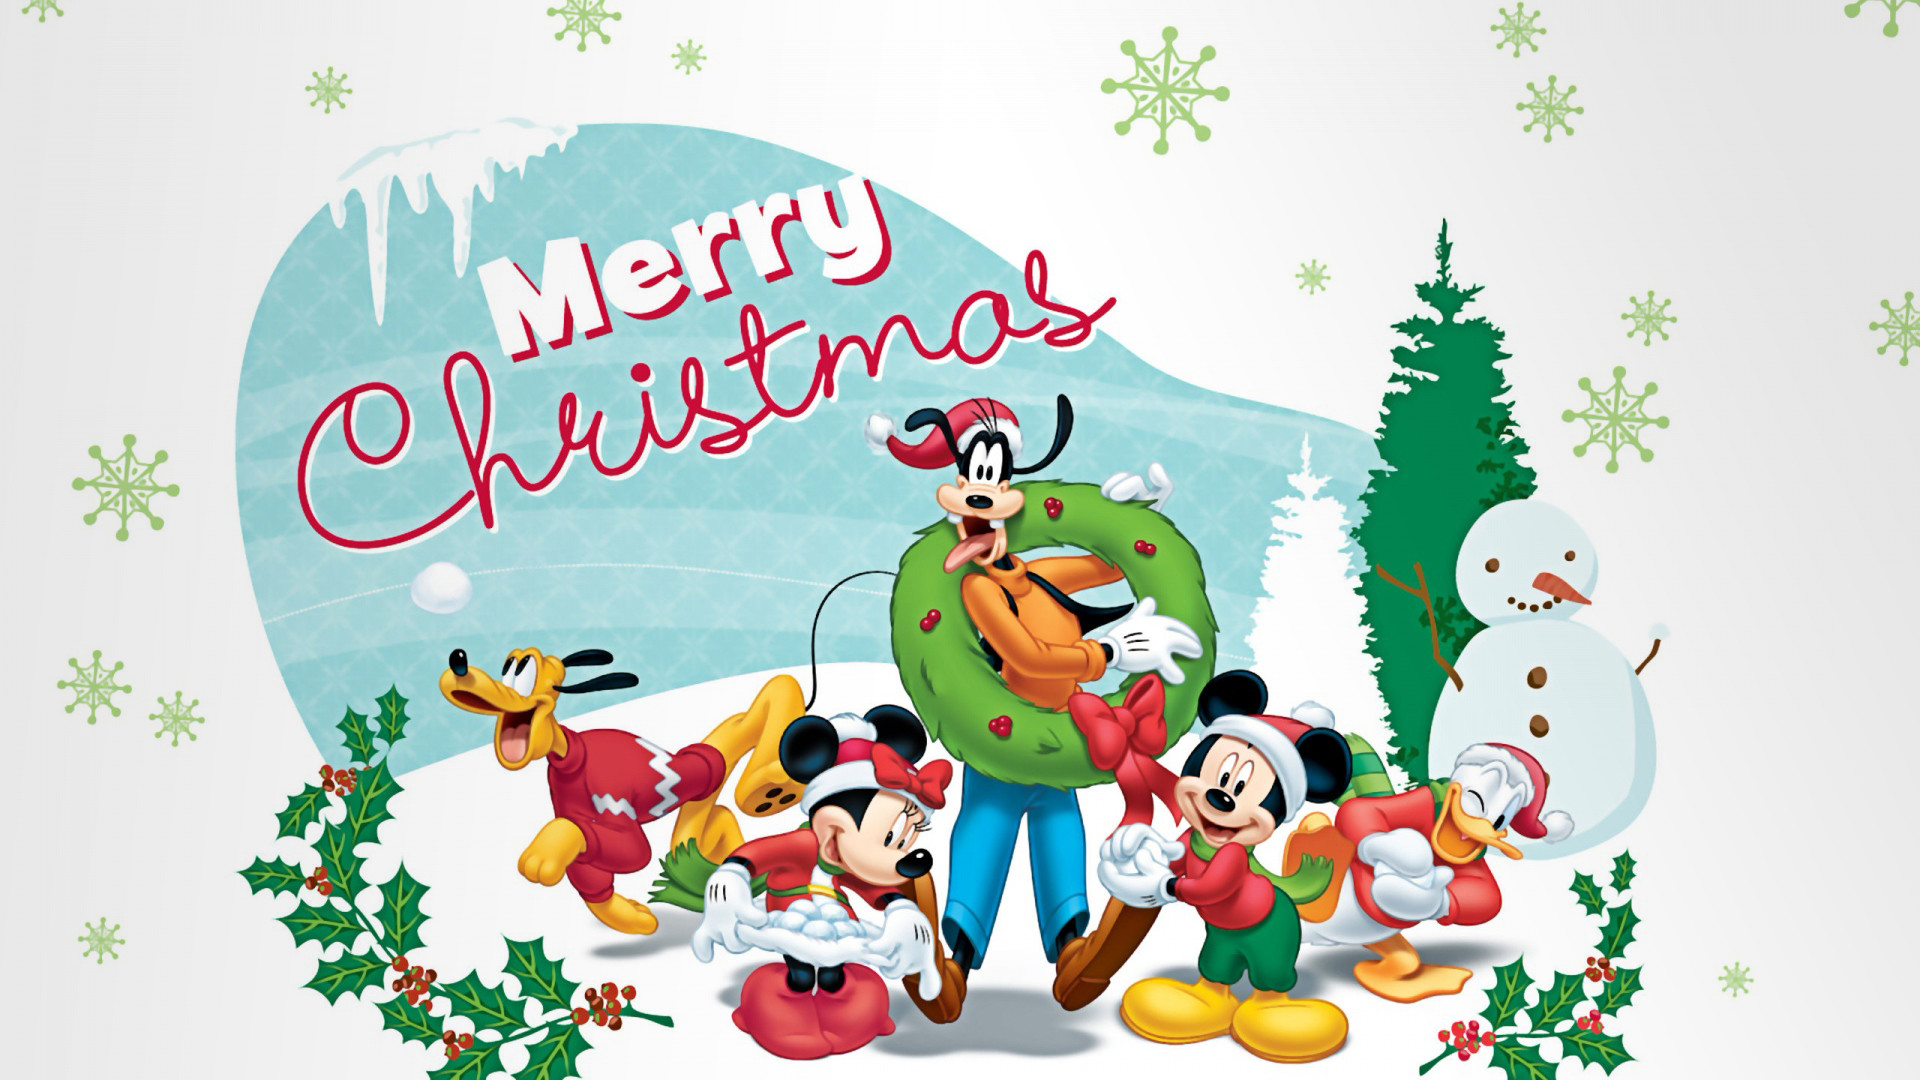 disney christmas wallpaper and screensavers 57 images